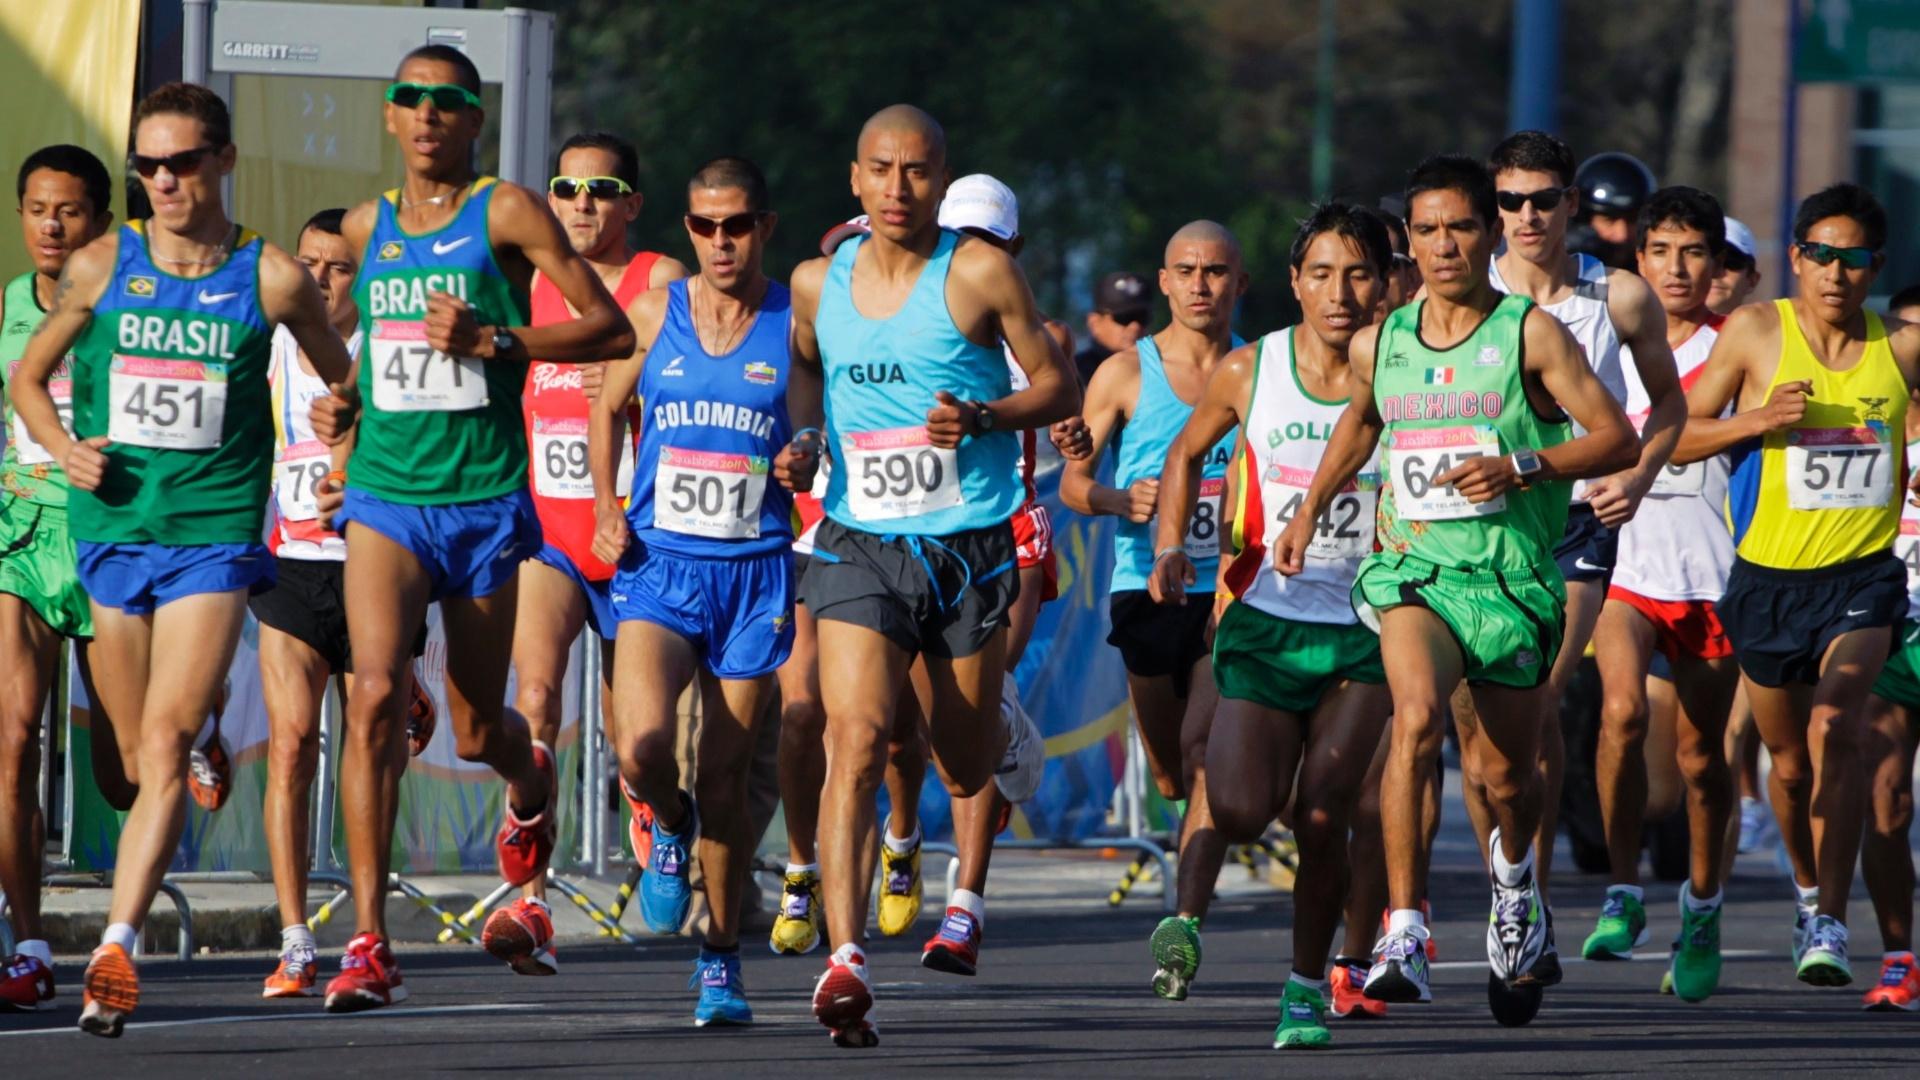 Os brasileiros Jean Carlos (esq) e Solonei da Silva durante a disputa da maratona nos Jogos Pan-Americanos de Guadalajara (30/10/2011)